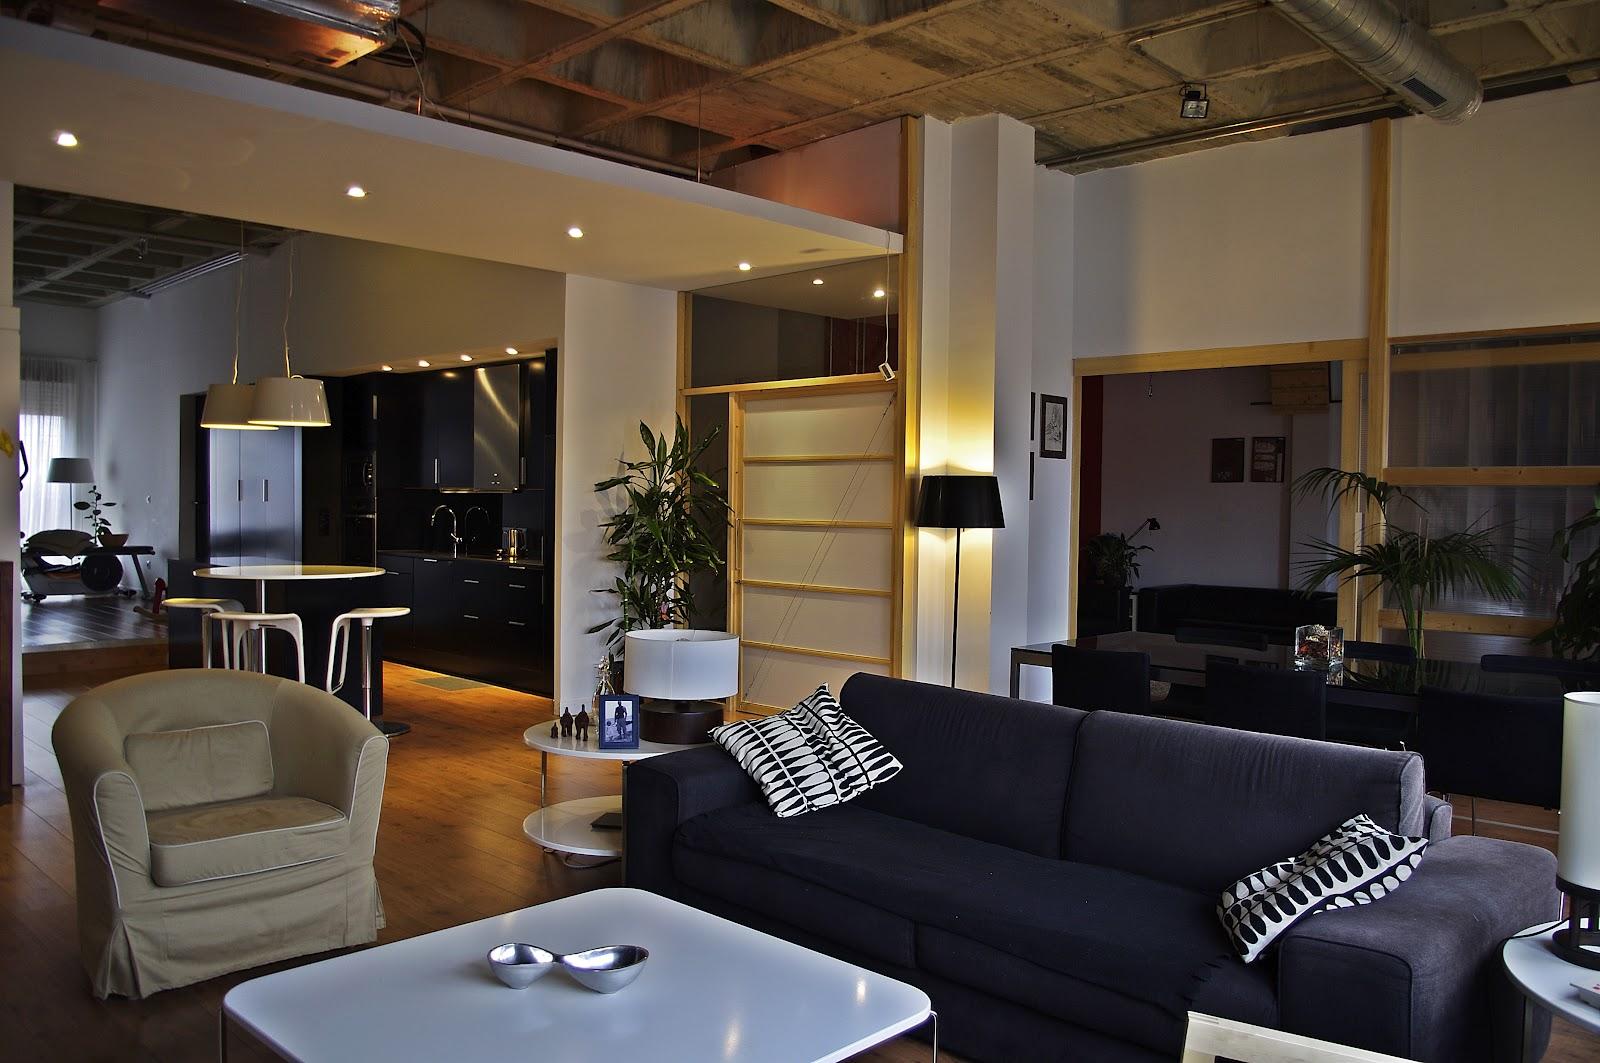 Loft en madrid samuel j vergara interiorismo y arquitectura - Lofts en madrid ...